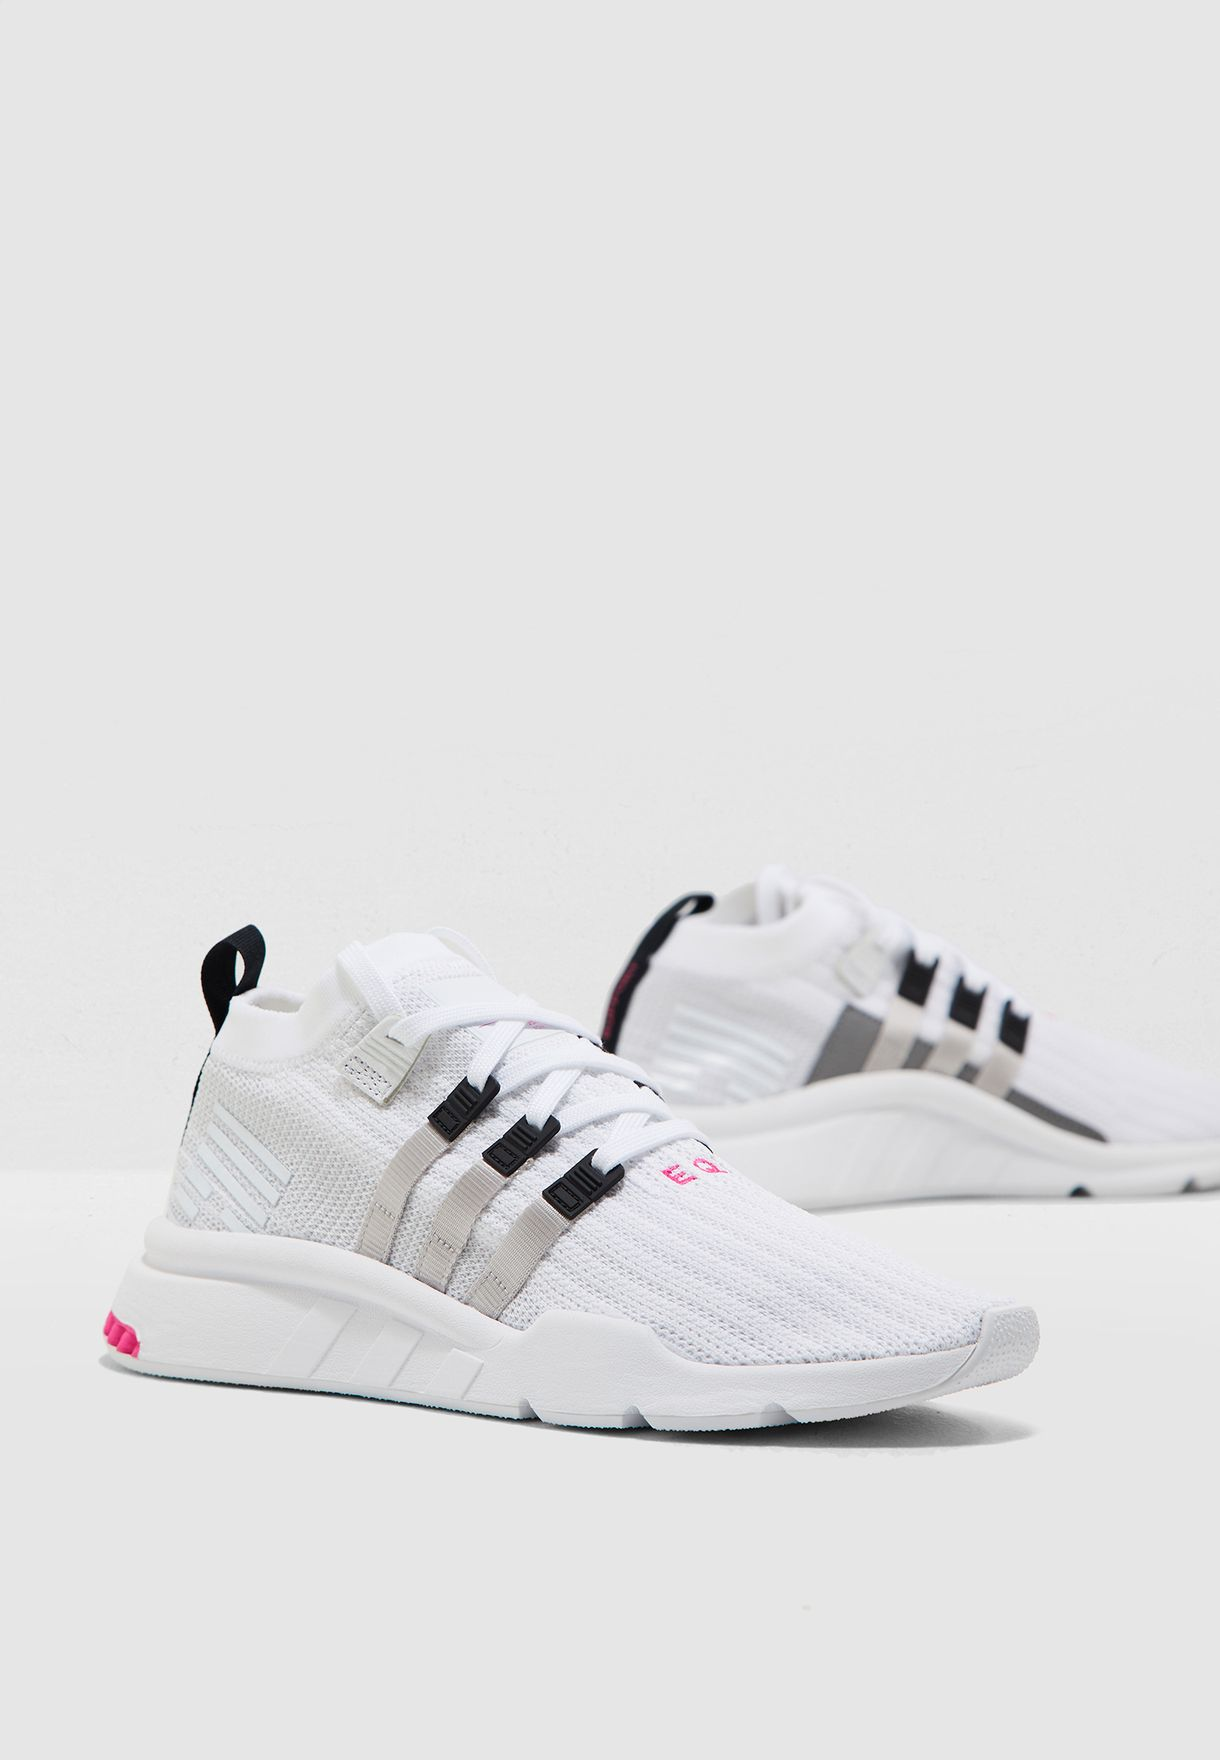 56b3ce003c77 Shop adidas Originals white EQT Support Mid ADV BD7502 for Men in UAE -  14448SH62RAP